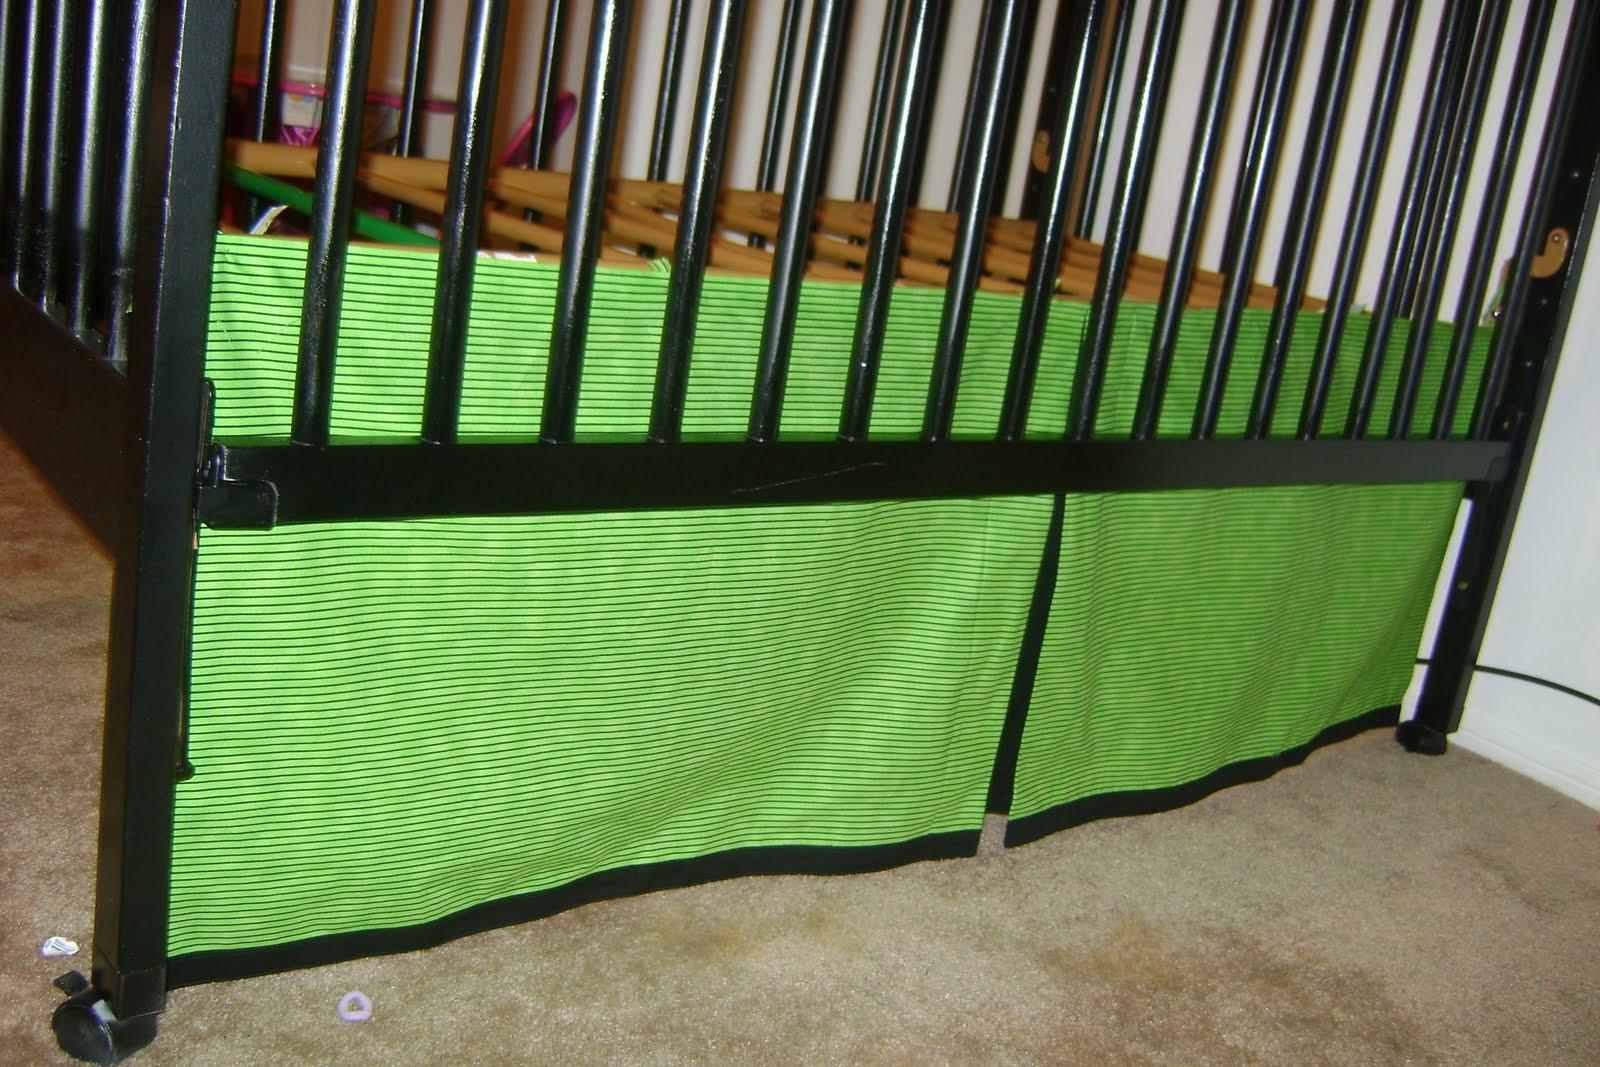 Bedskirts-Dust Ruffles - 14-inch Drop - 18-inch Drop - 21-inch